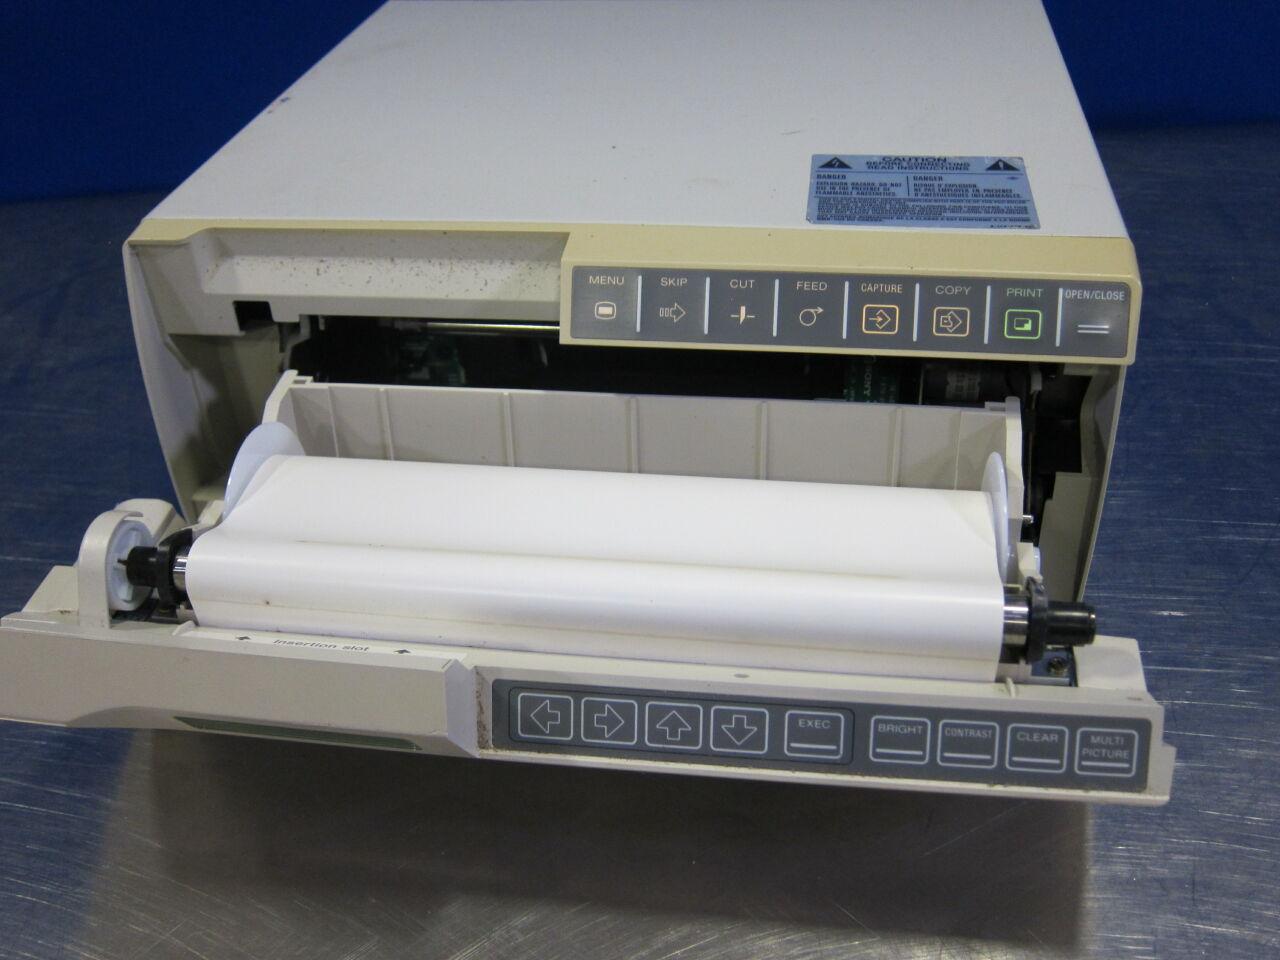 SONY UP-980 Printer